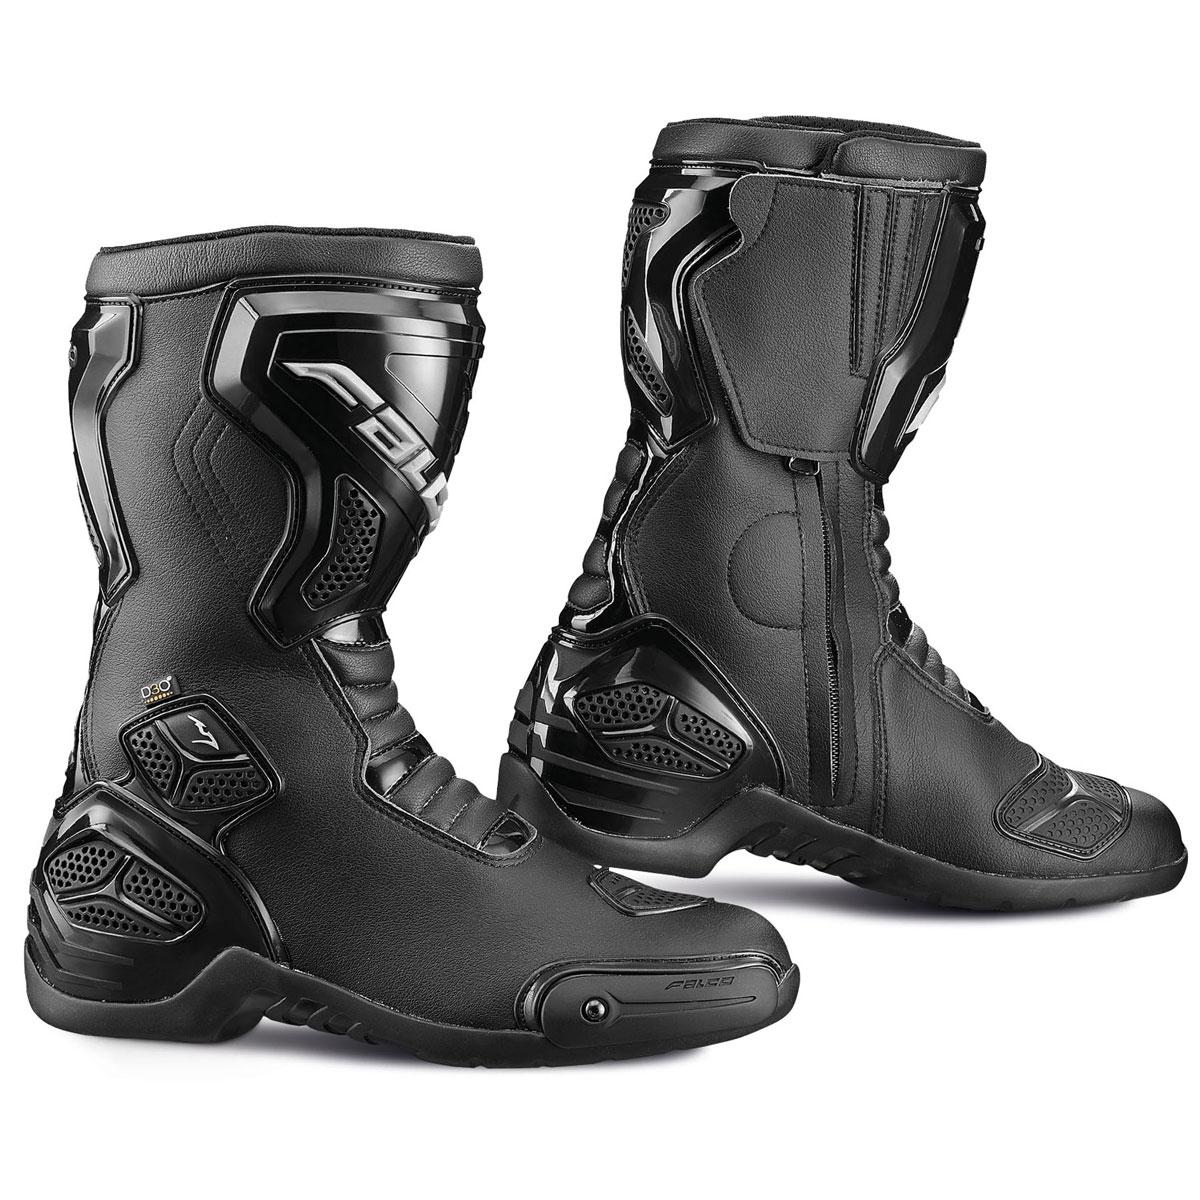 OXEGEN 2 Sport Touring Boots